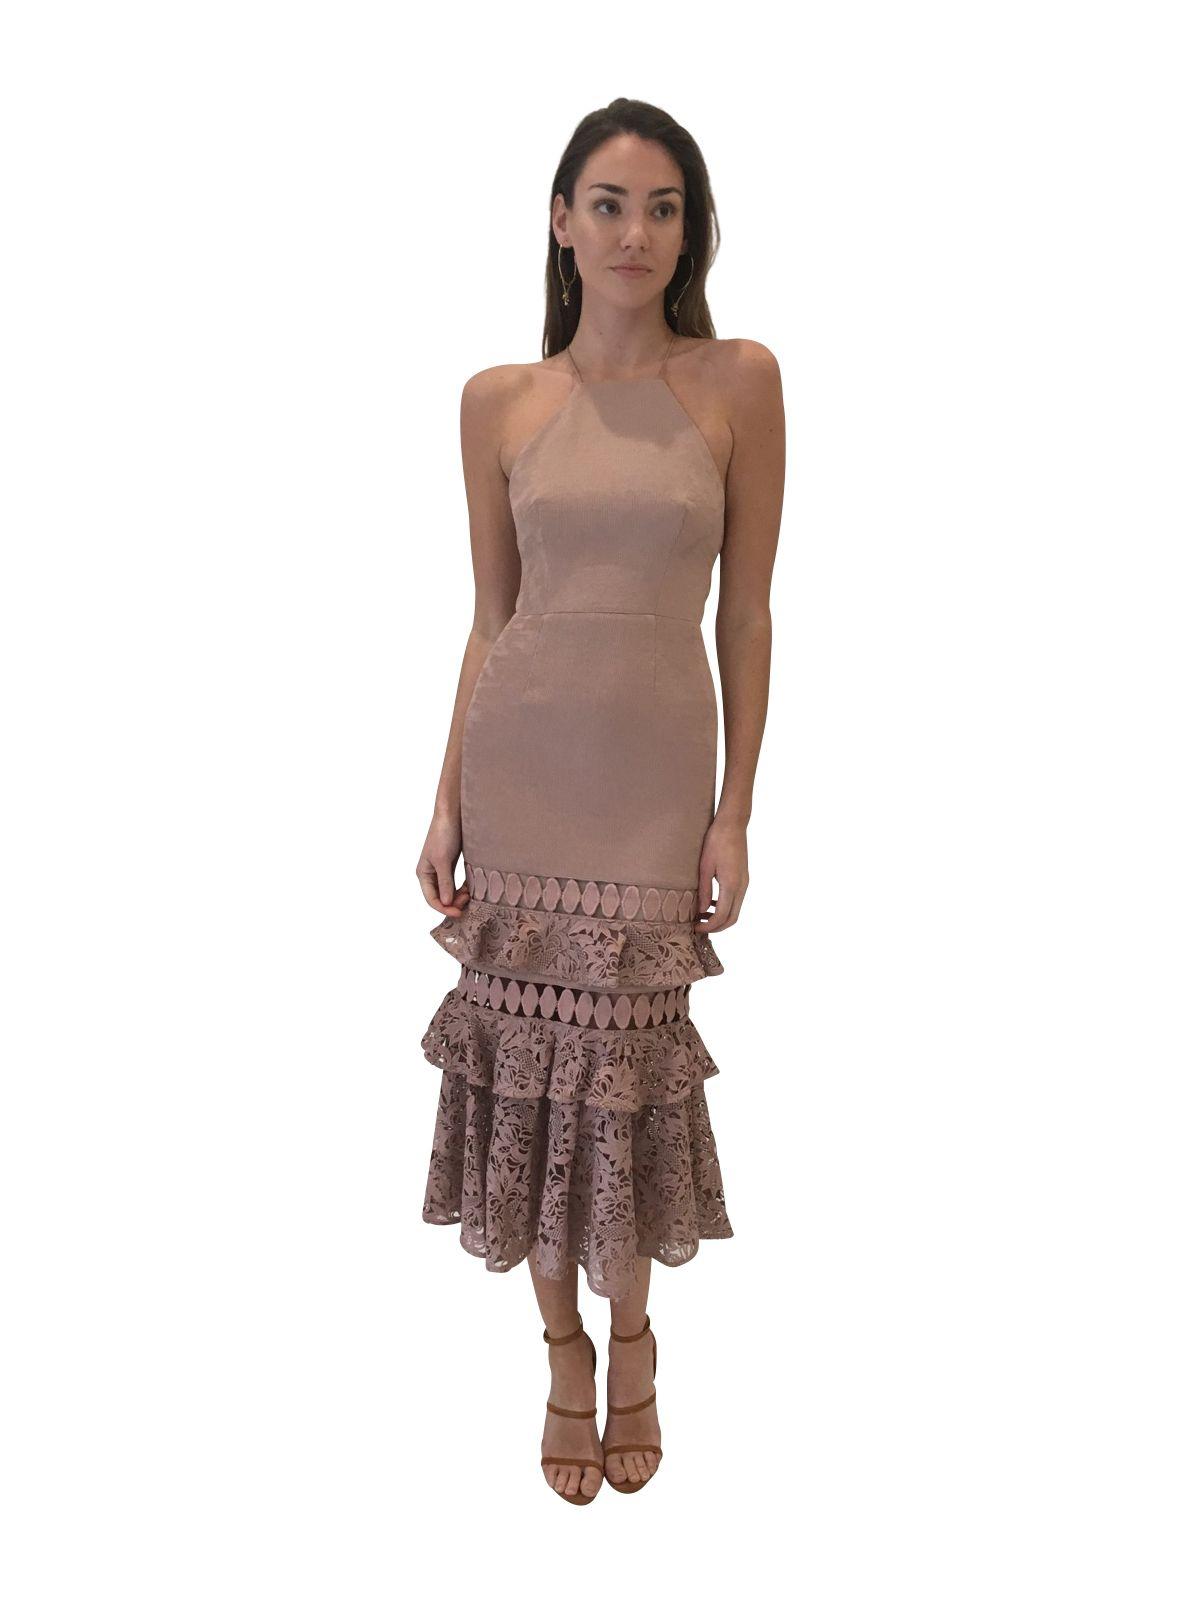 bef31b1840 Talulah Valencia Rose Halter Ruffle Midi Dress in Woodrose  Size  XS ...